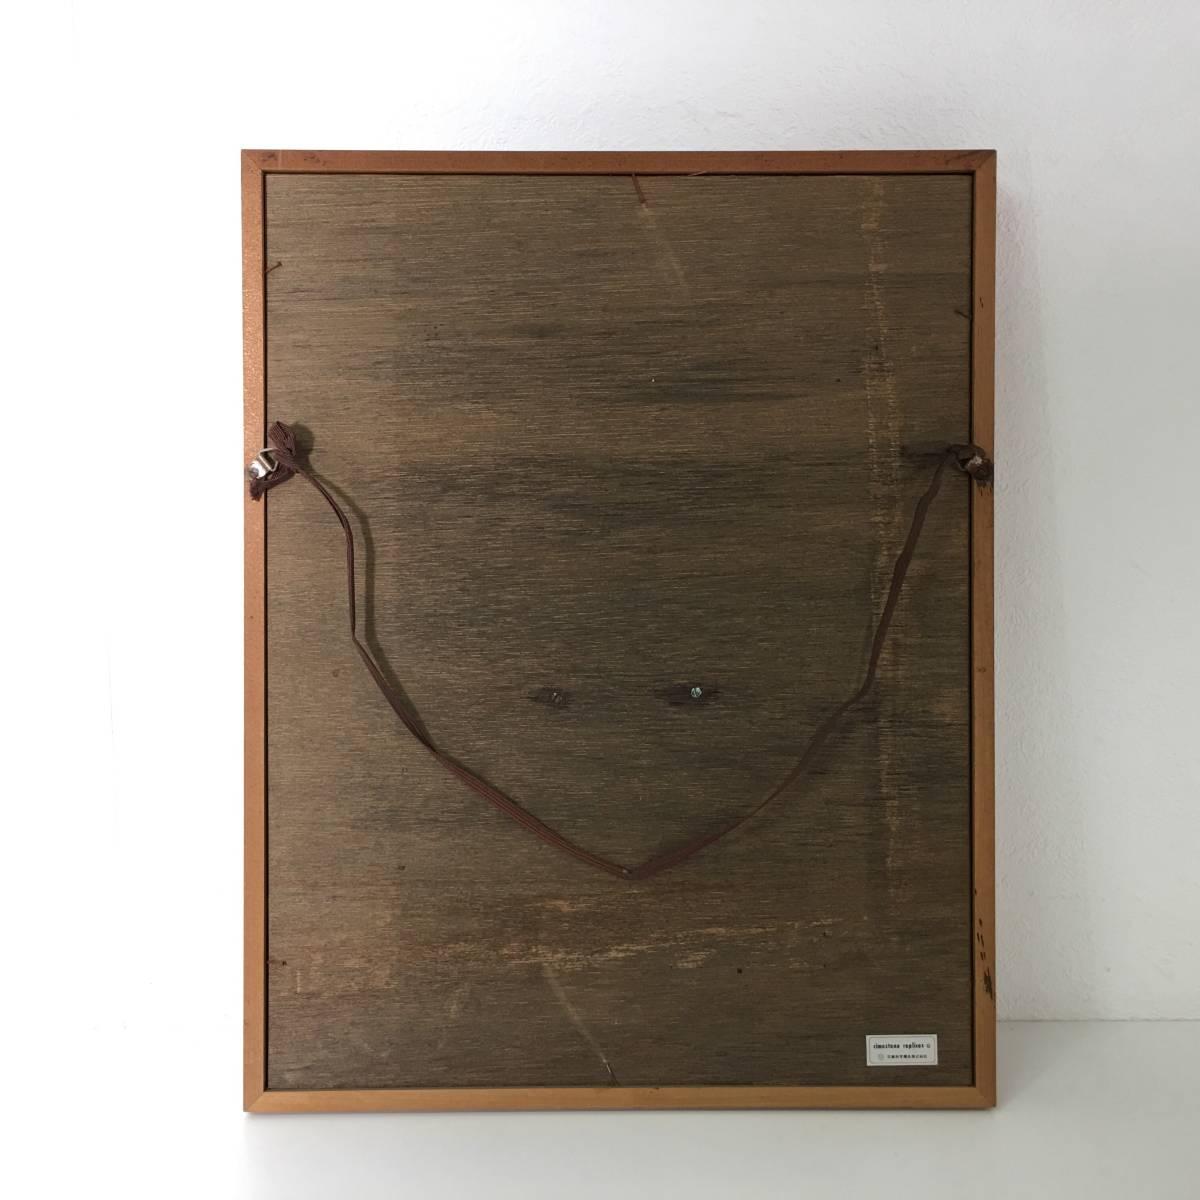 kt11/120 レリーフ 観音像 京都科学標本株式会社 cimastone replicas 額47×37×3cm 陶器製? 壁掛け 工芸美術品_画像8